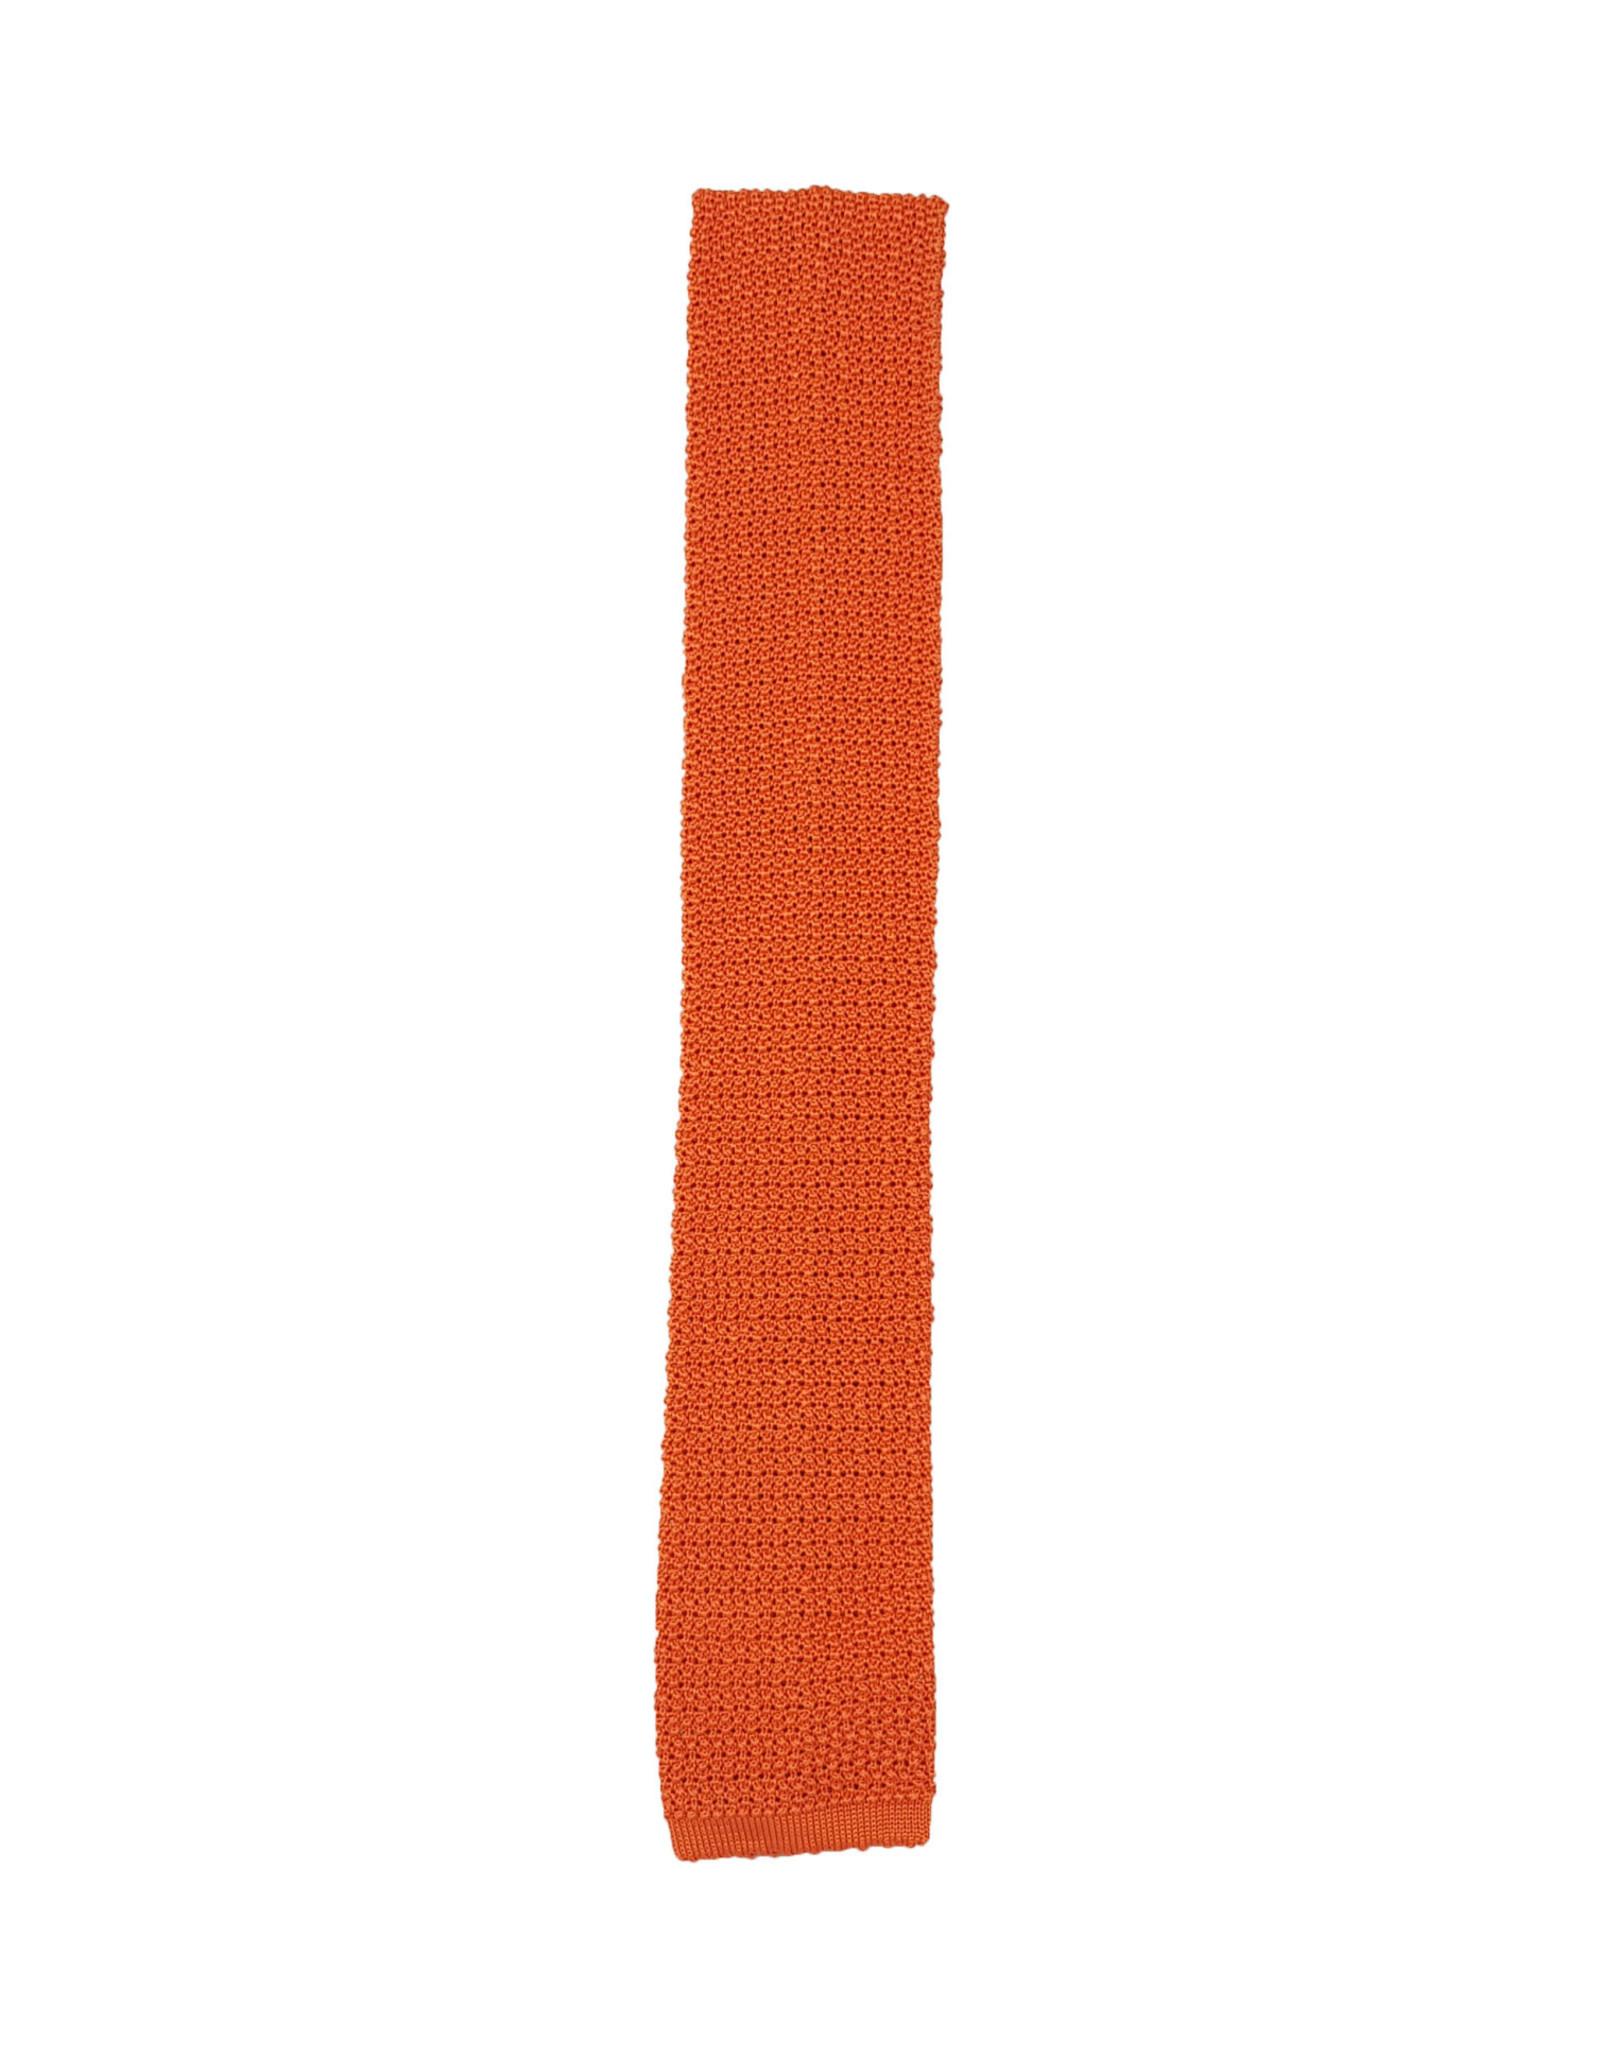 Ascot Sandmore's gebreide das oranje 631502/34